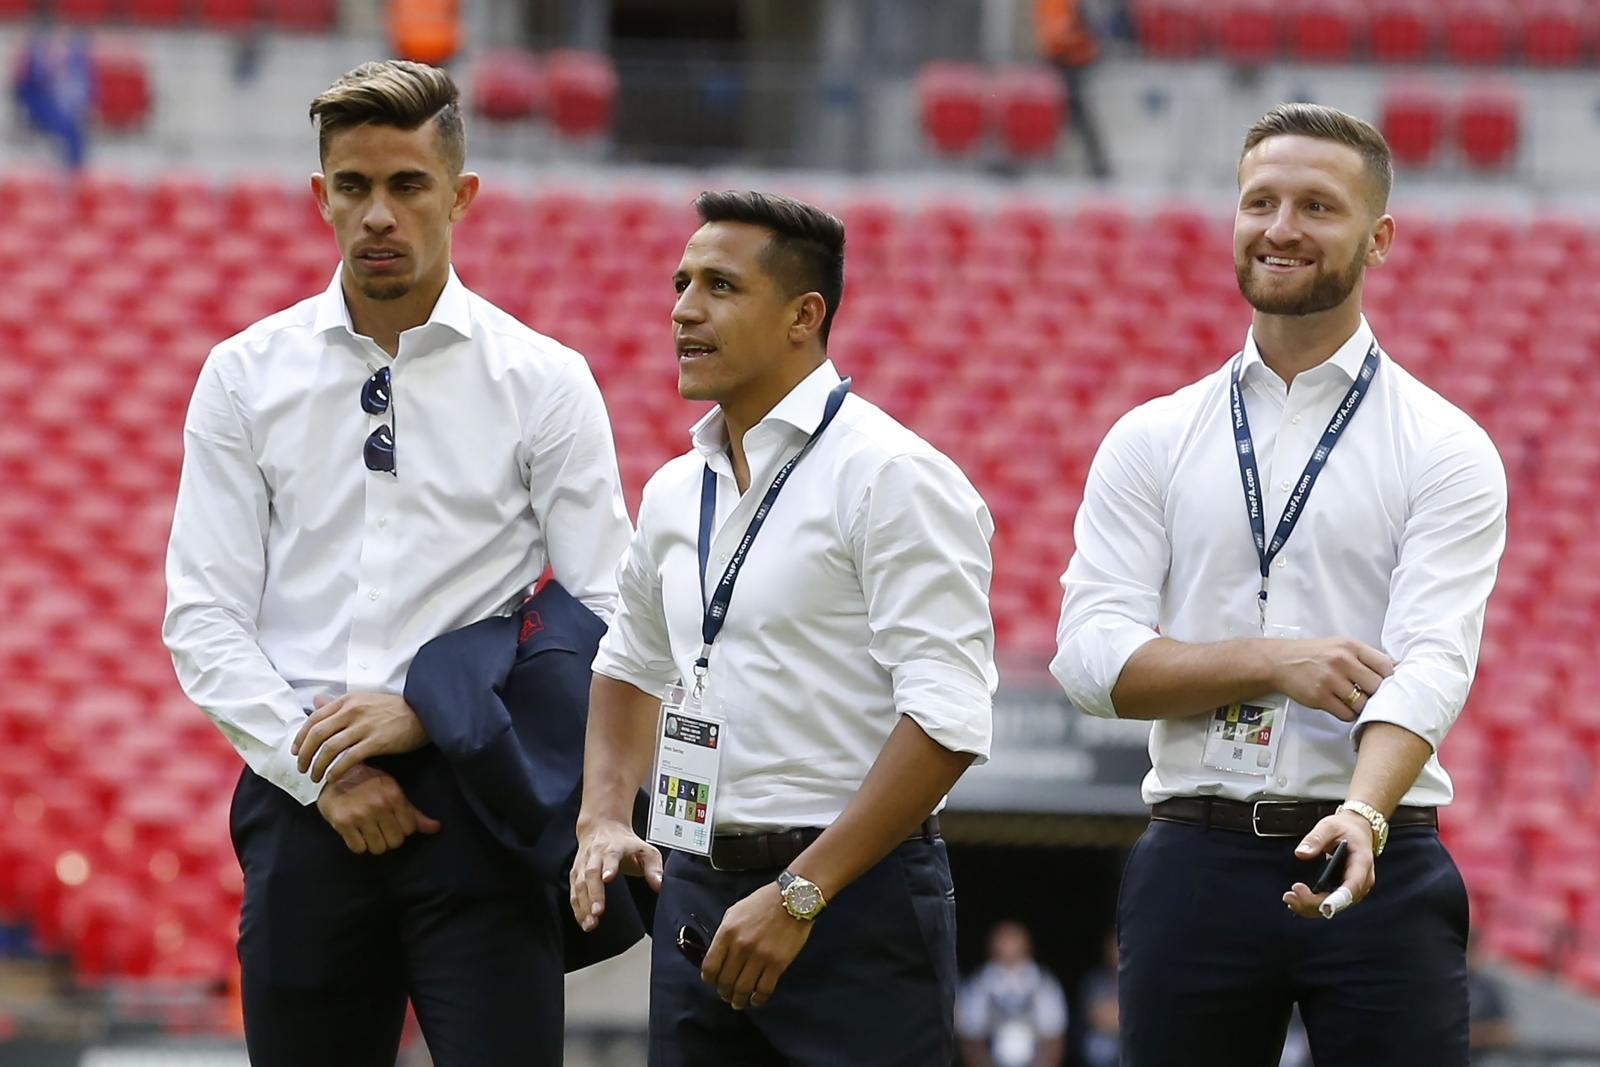 Gabriel Paulista, Alexis Sanchez and Shkodran Mustafi